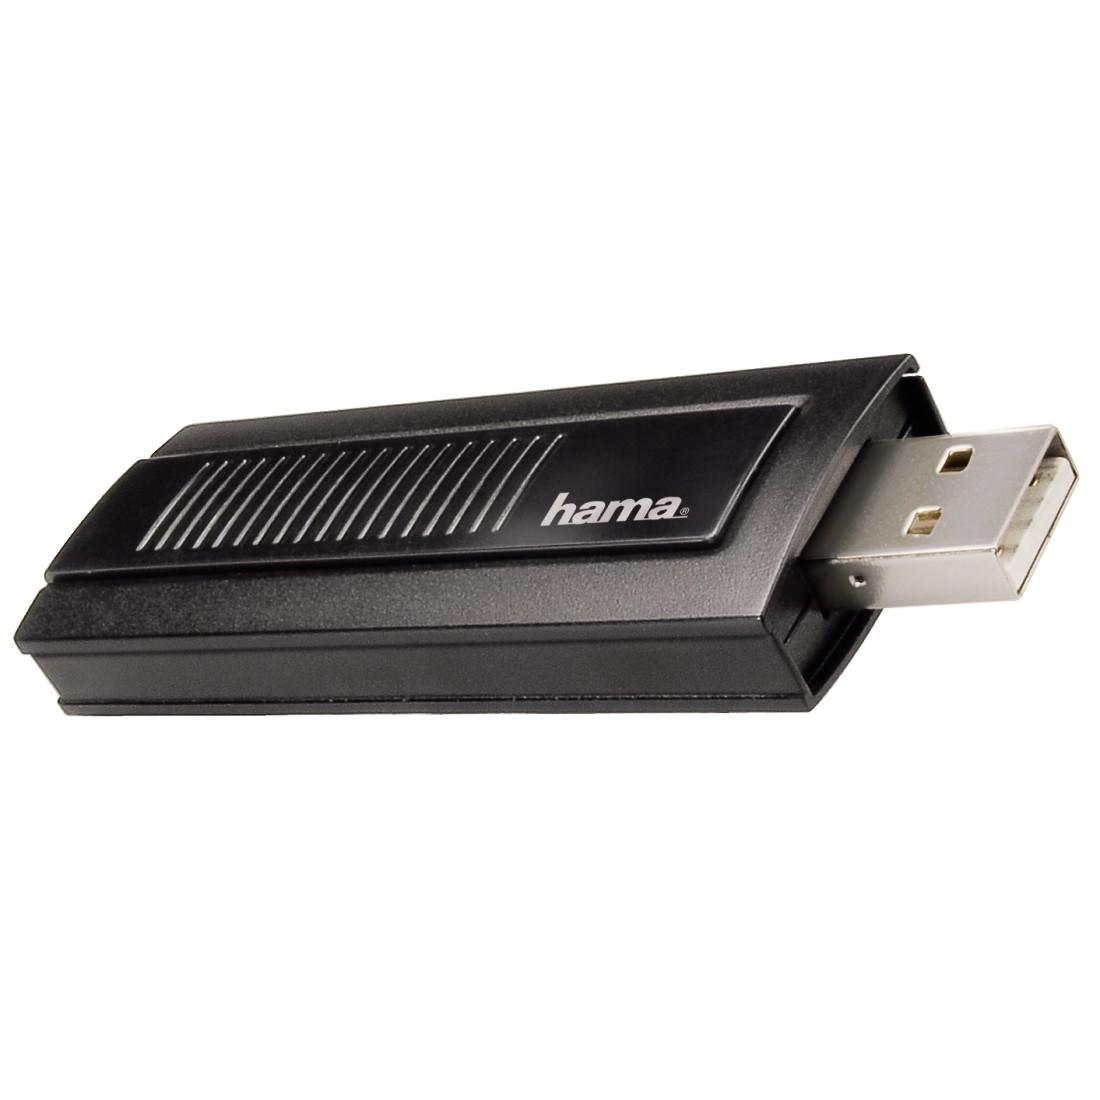 HAMA 54 Mbps WLAN USB 2.0 Stick Drivers Update